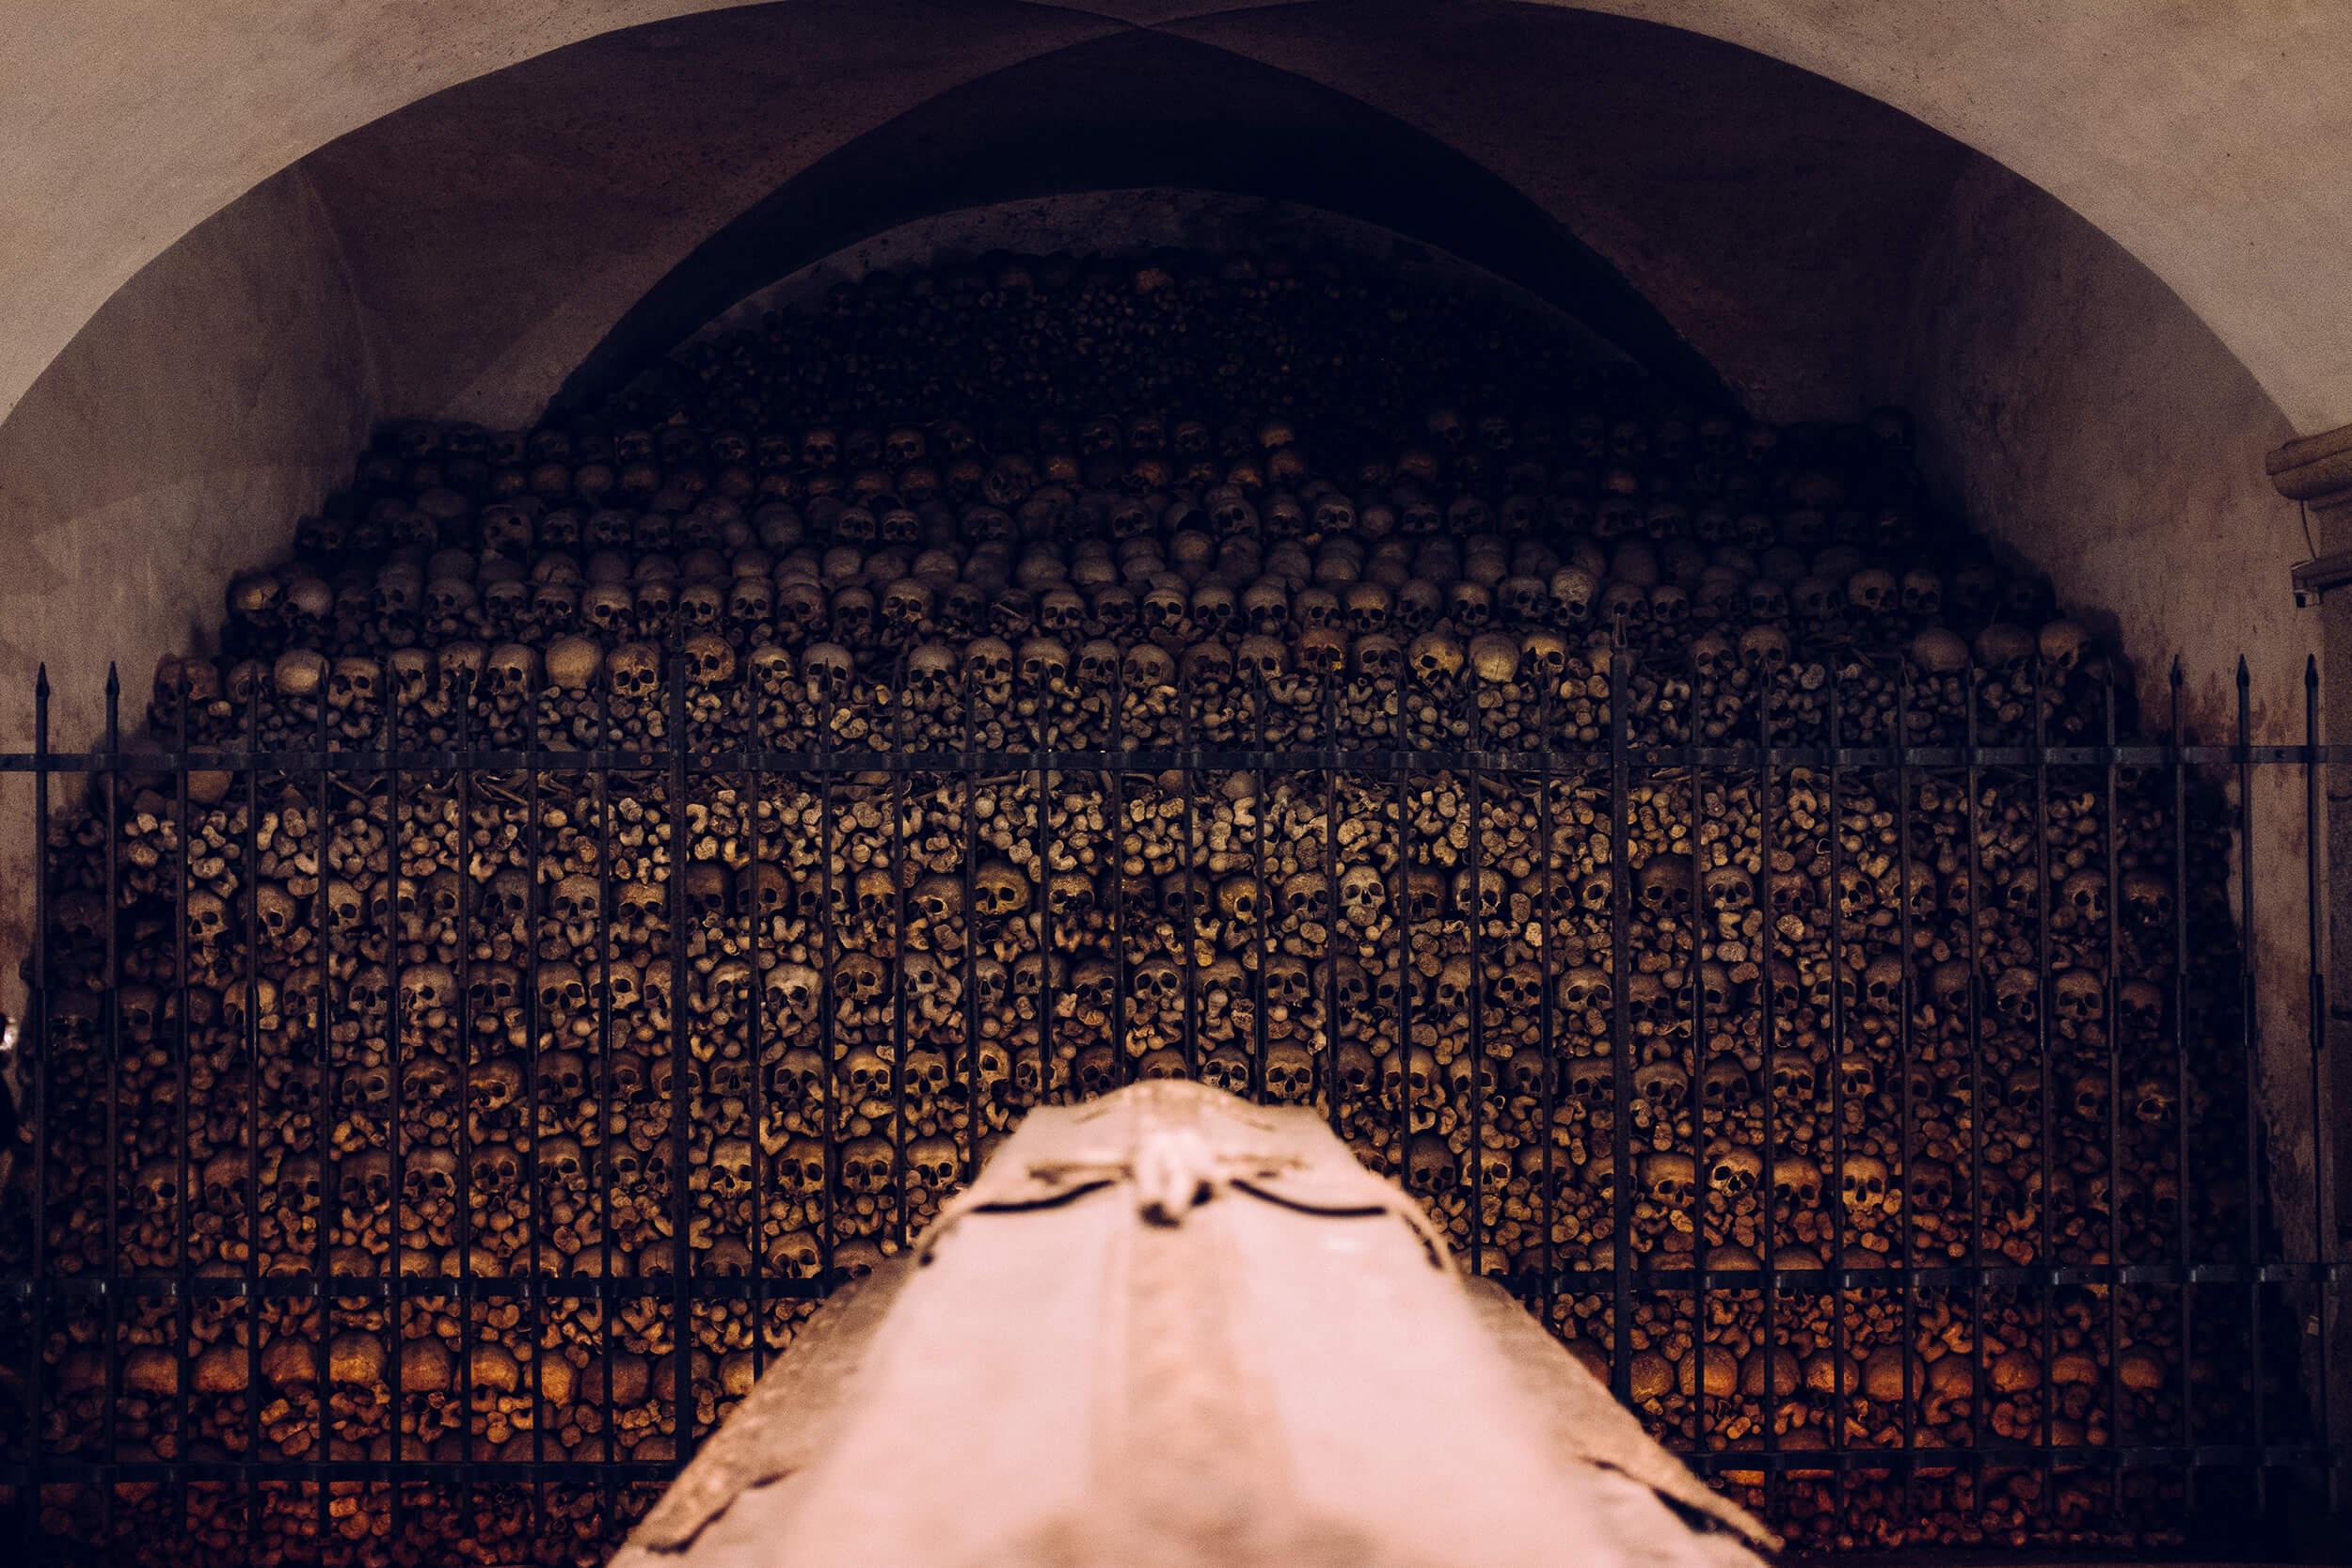 St. Florian Monastery basilica catacombs